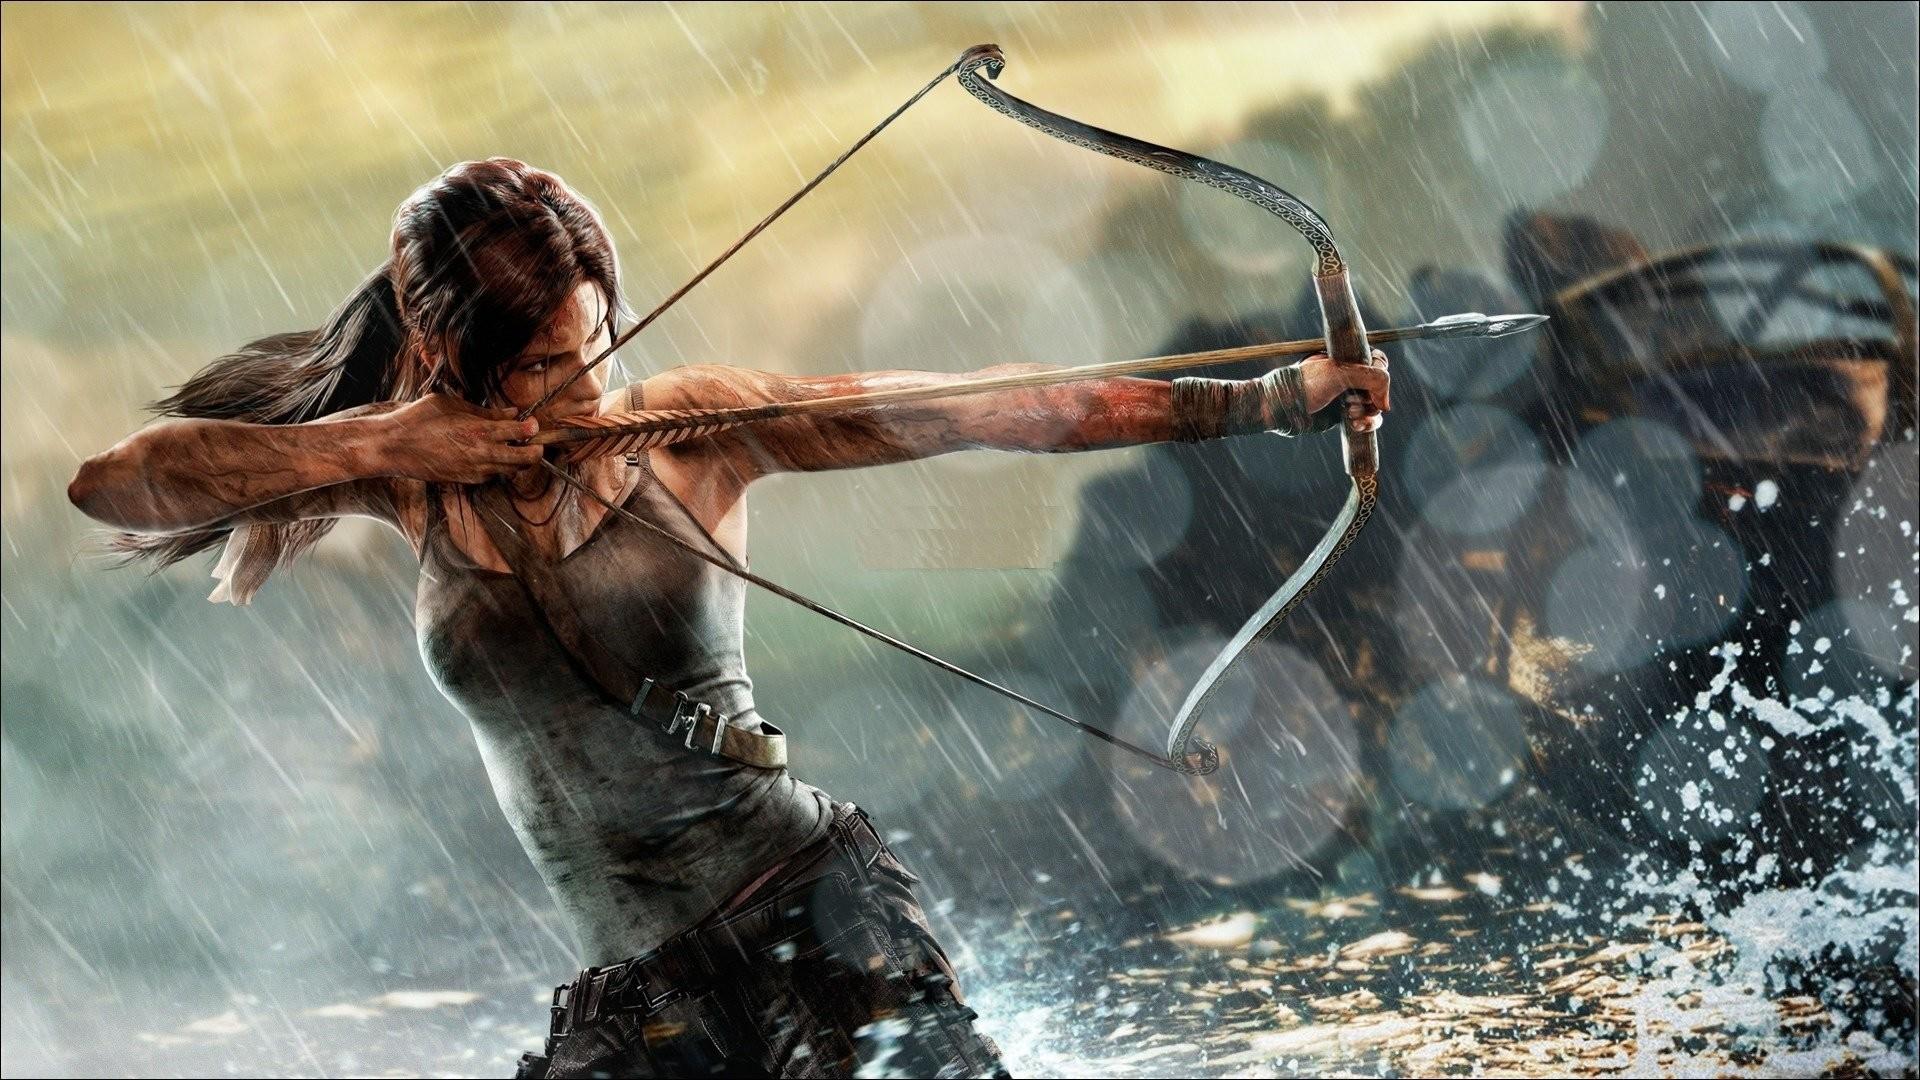 RISE TOMB RAIDER lara croft action adventure fantasy warrior wallpaper      819534   WallpaperUP